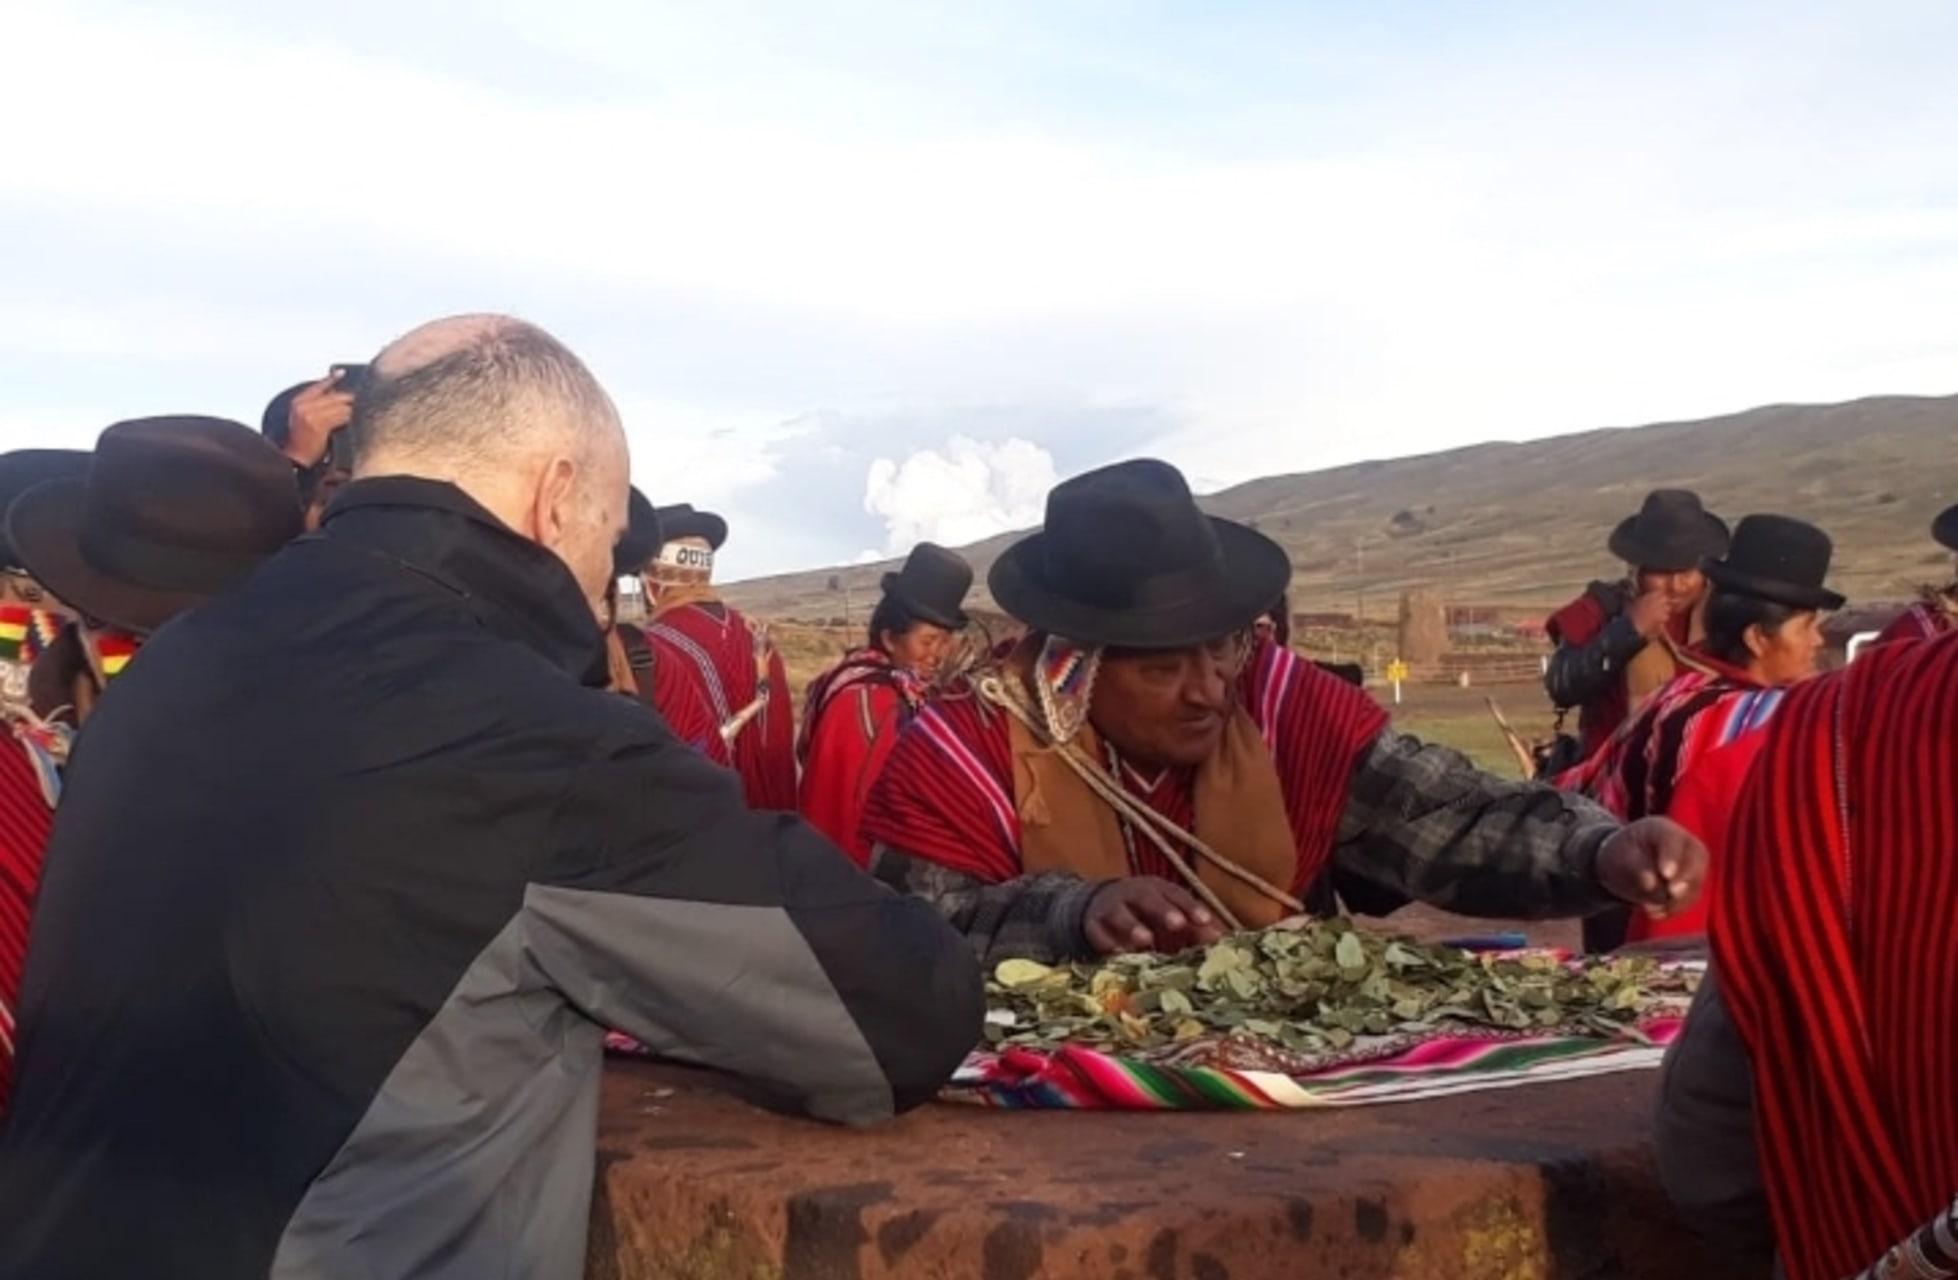 La Paz - Pachamama: Cable Car and Ritual